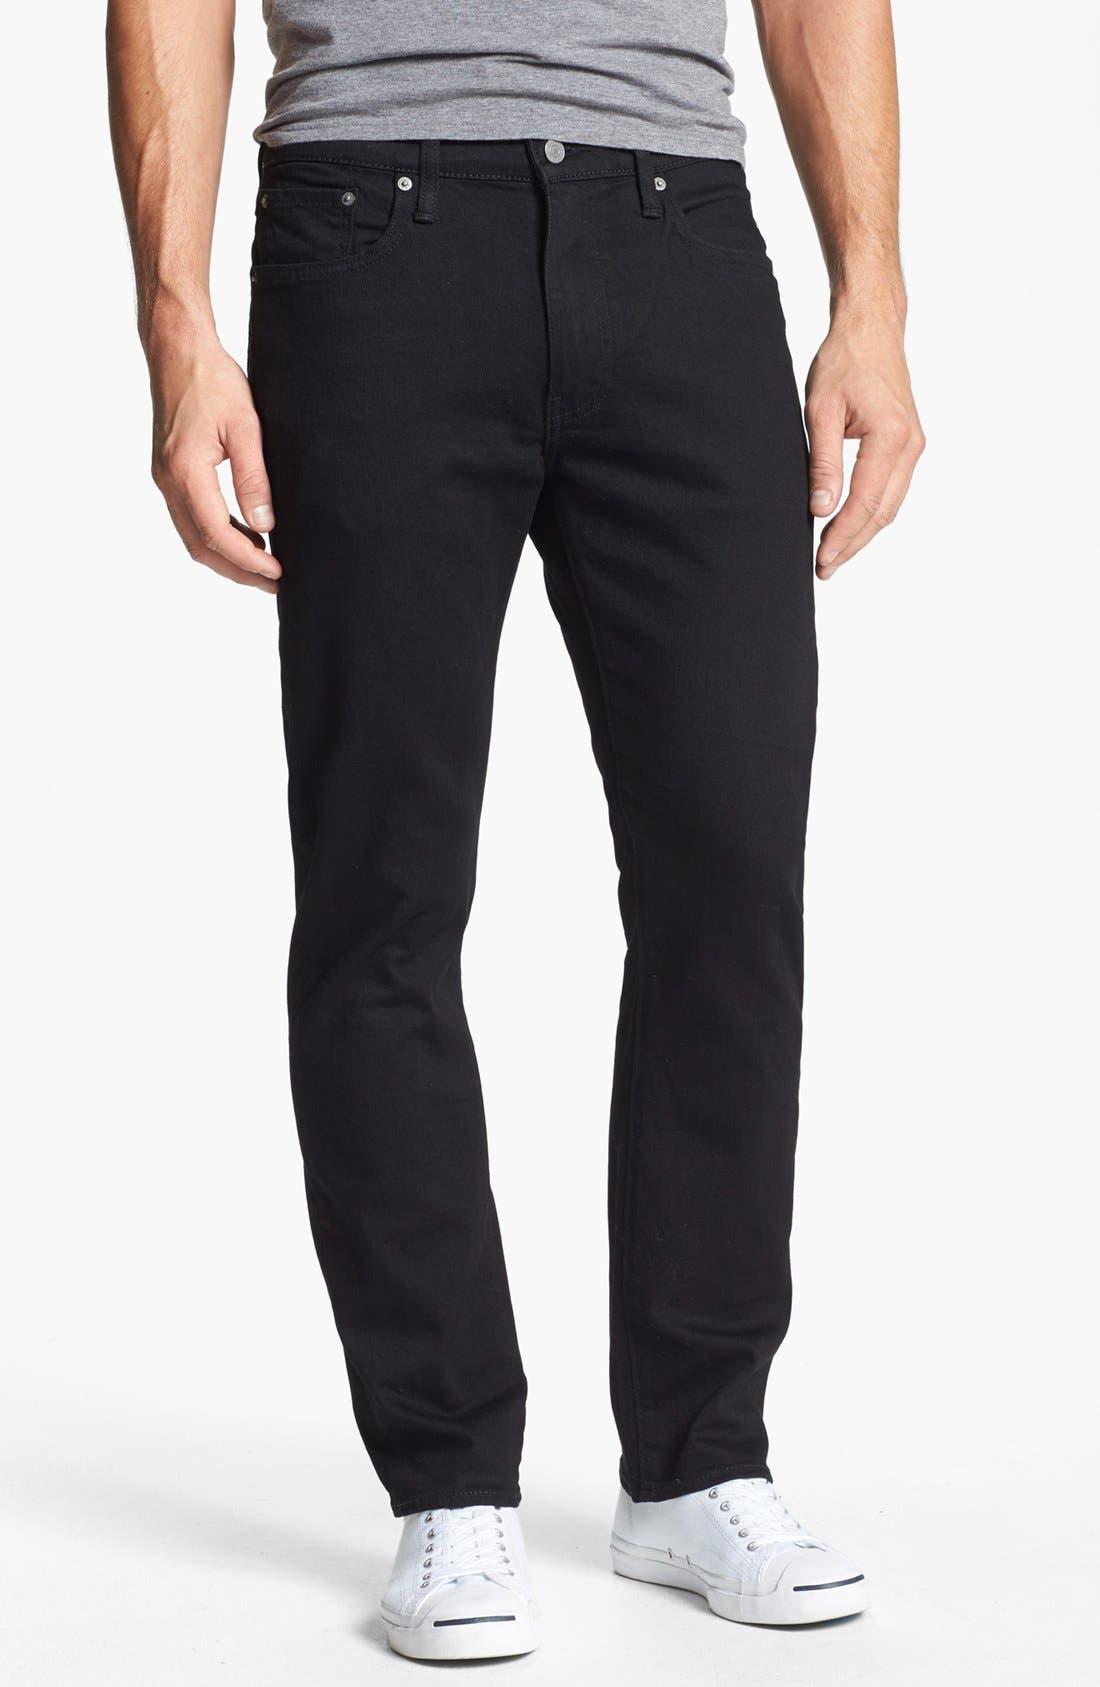 Alternate Image 1 Selected - Levi's® 513™ Slim Straight Leg Jeans (Nightshine)